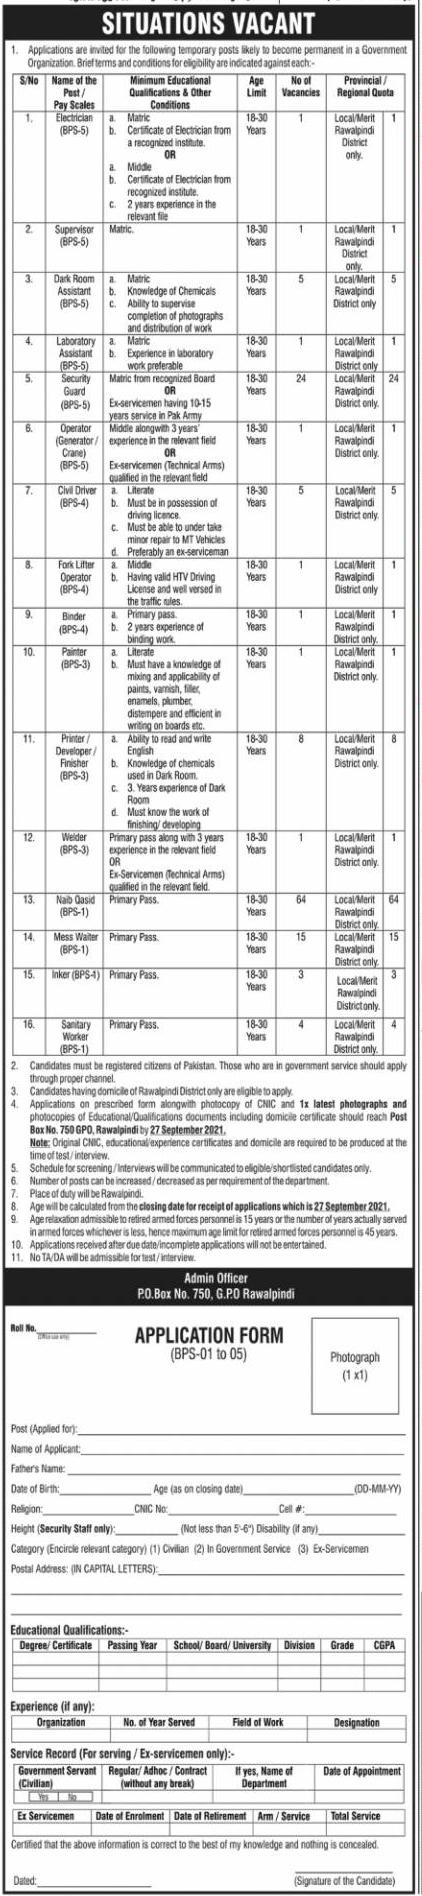 PO Box 750 Rawalpindi Jobs 2021 Government Organization